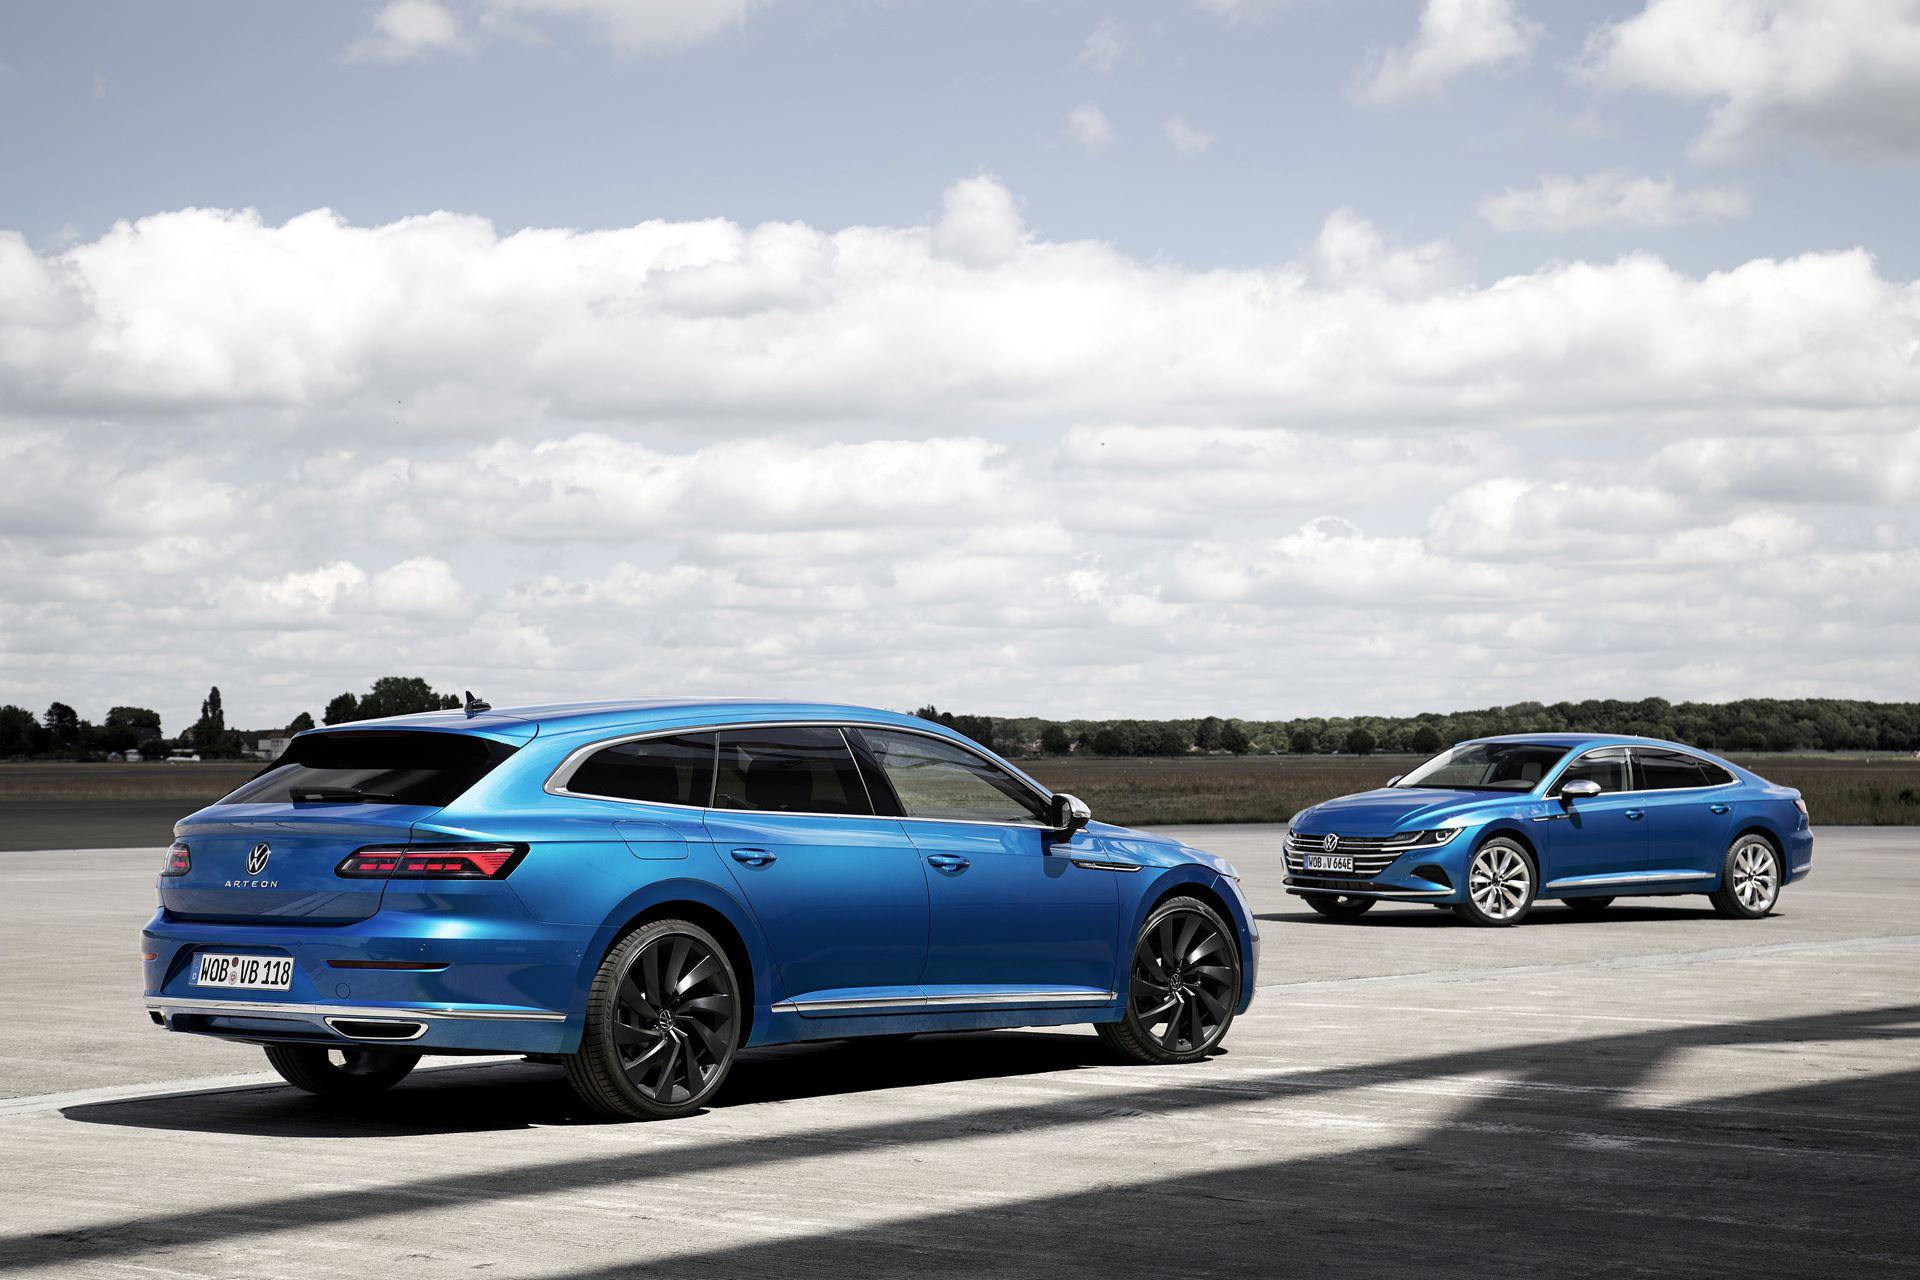 Volkswagen Arteon eHYBRID Elegance and Arteon Shooting Brake Elegance